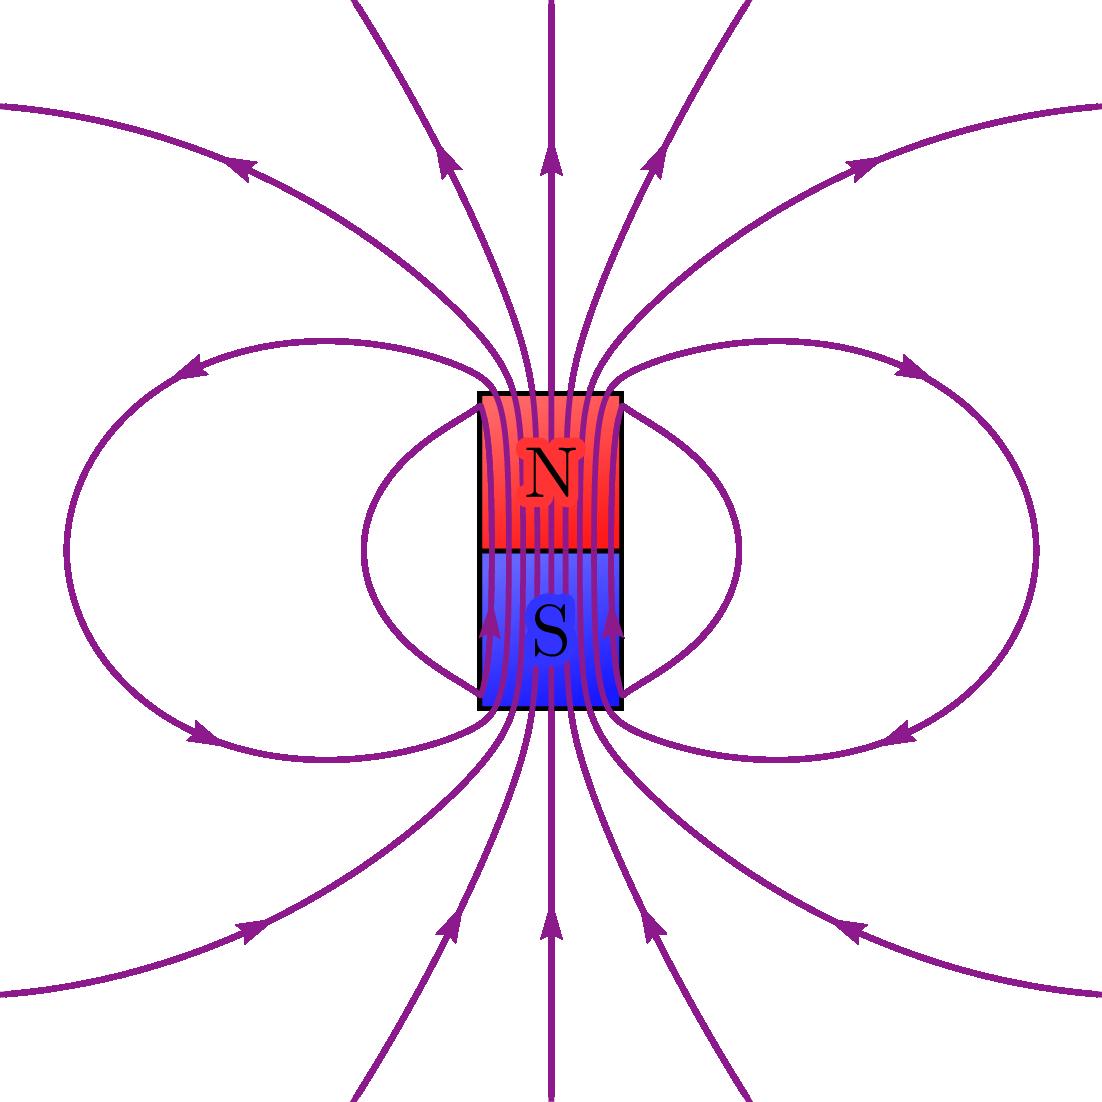 magnet_fieldlines_pstricks